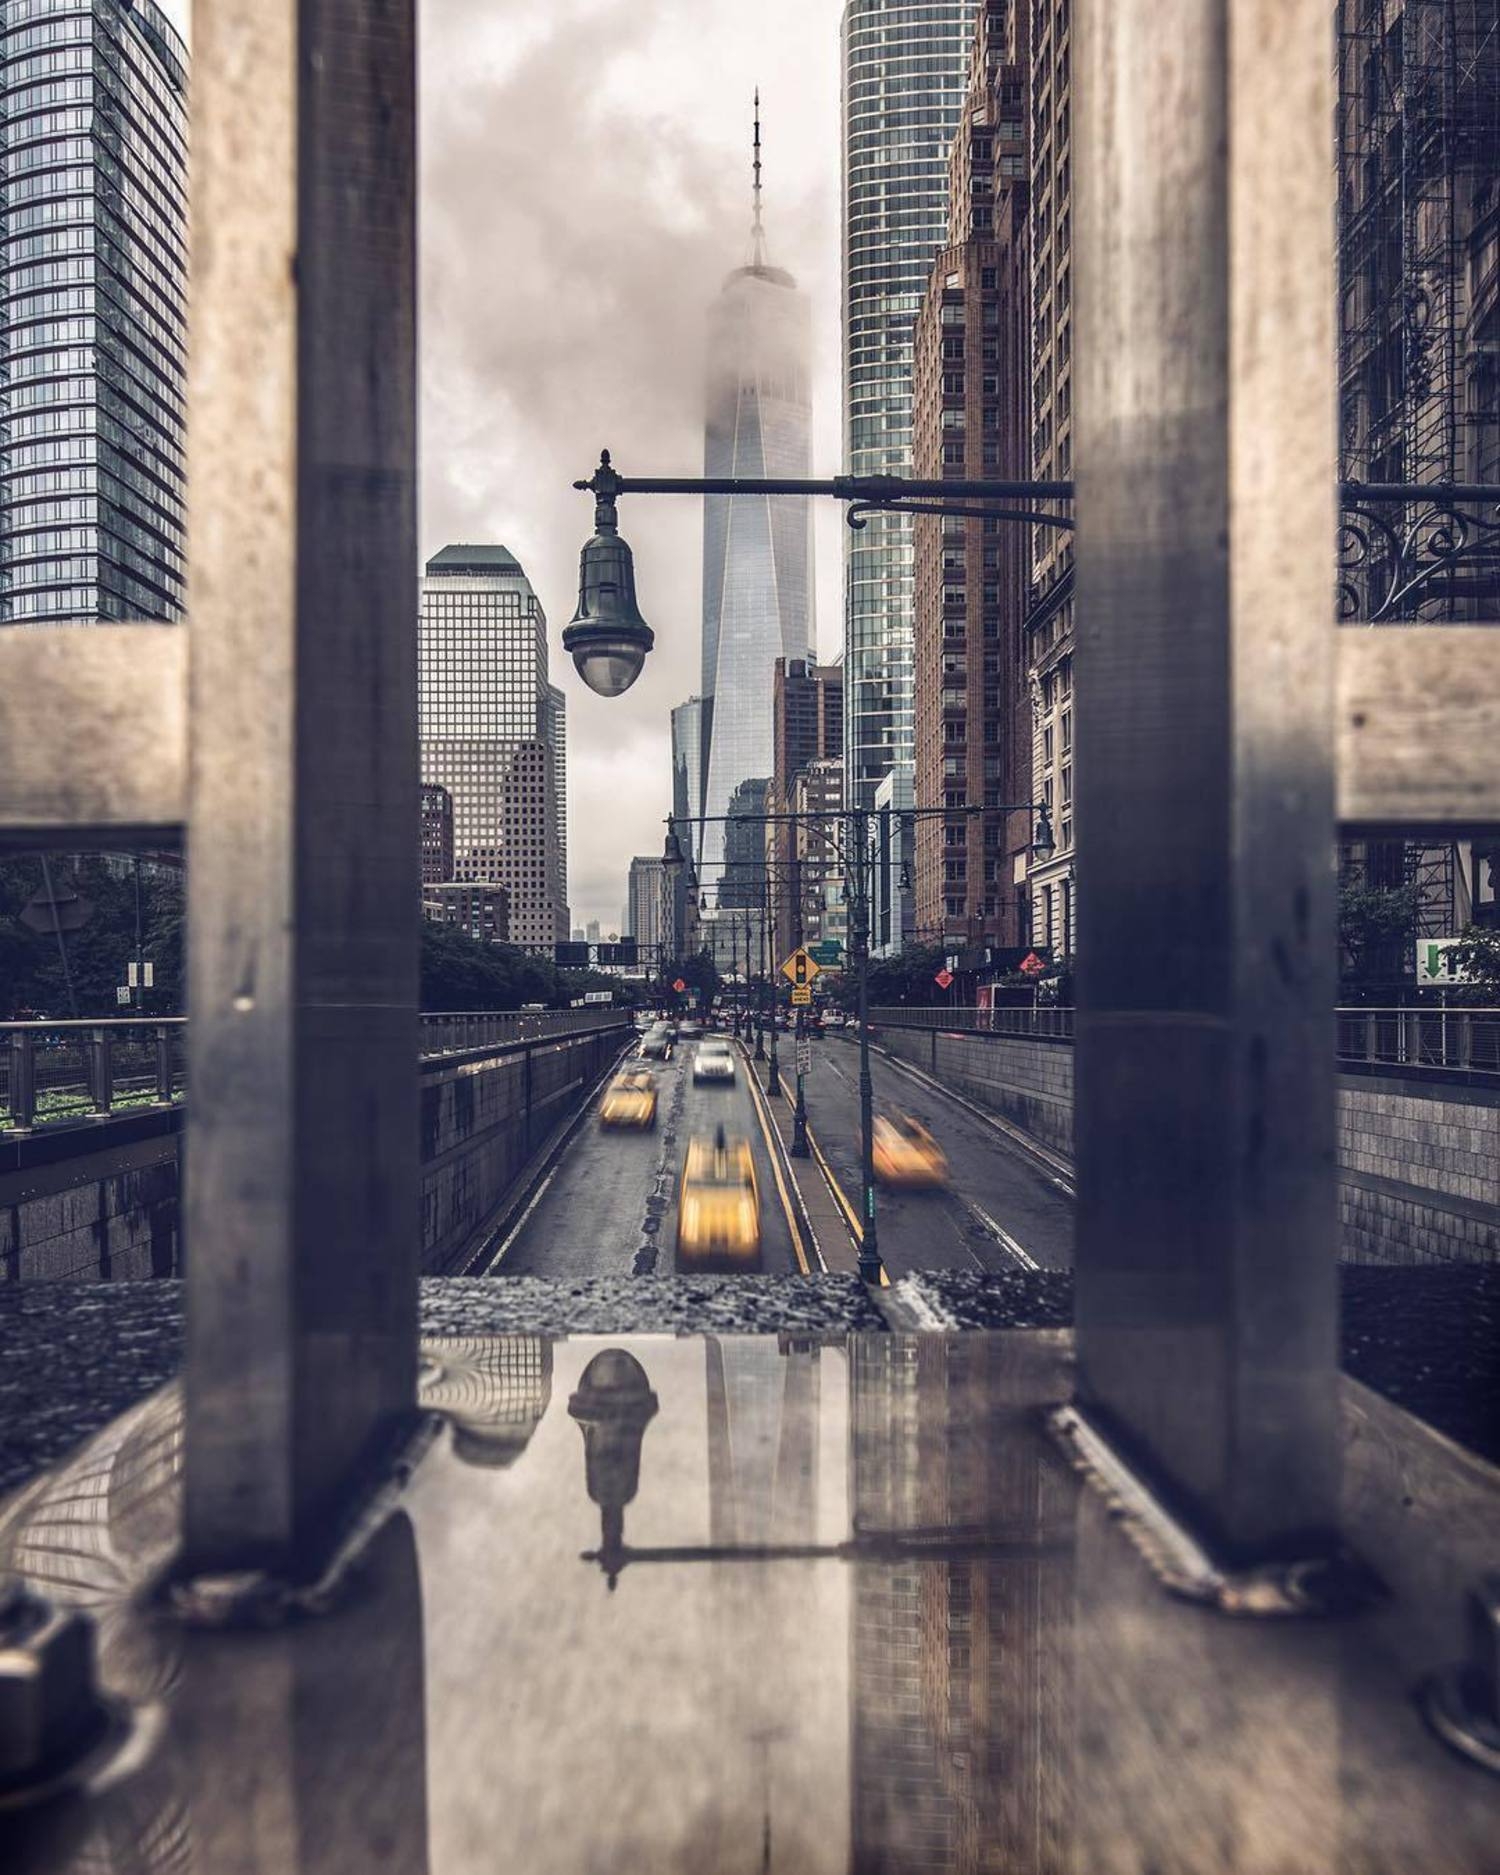 New York, New York. Photo via @rwakeland #viewingnyc #newyork #newyorkcity #nyc #oneworldtradecenter